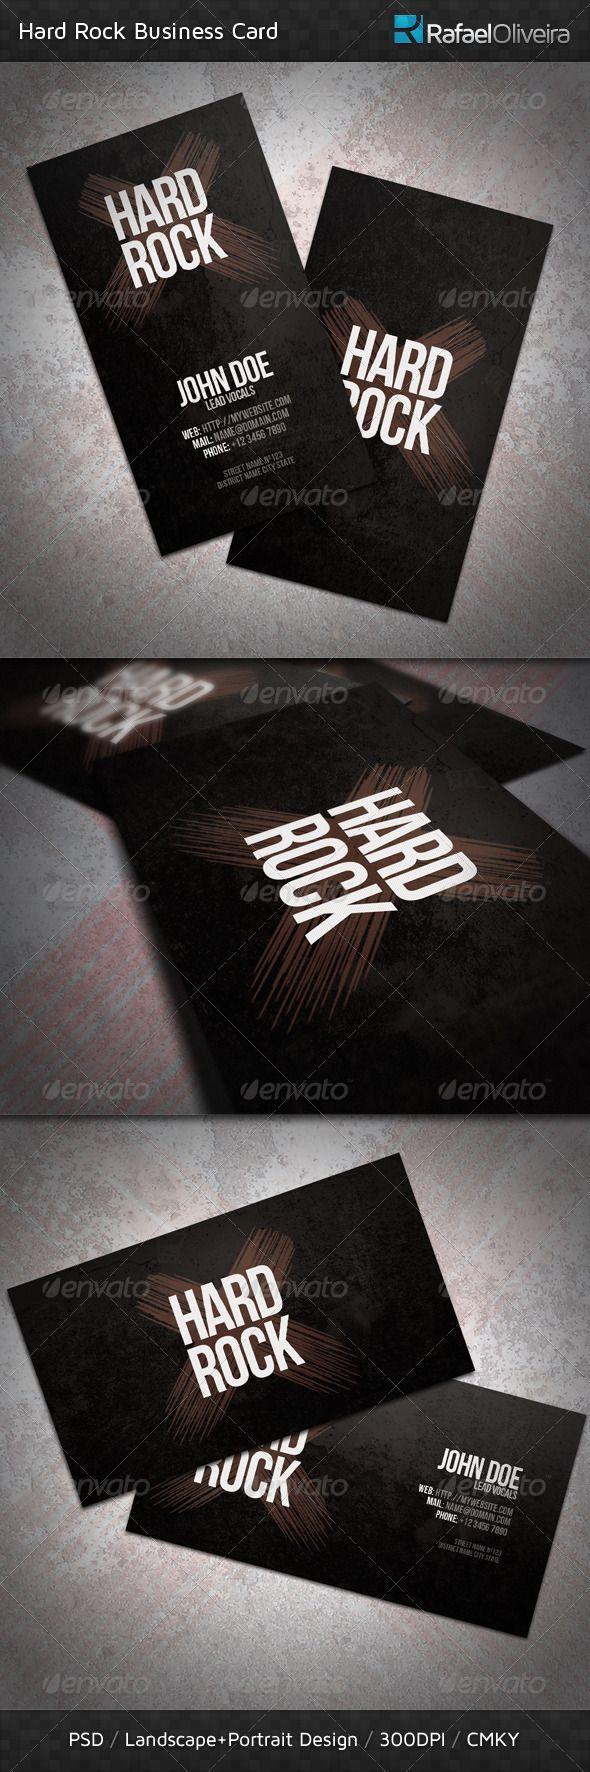 100 best Print Templates images on Pinterest | Print templates, Font ...